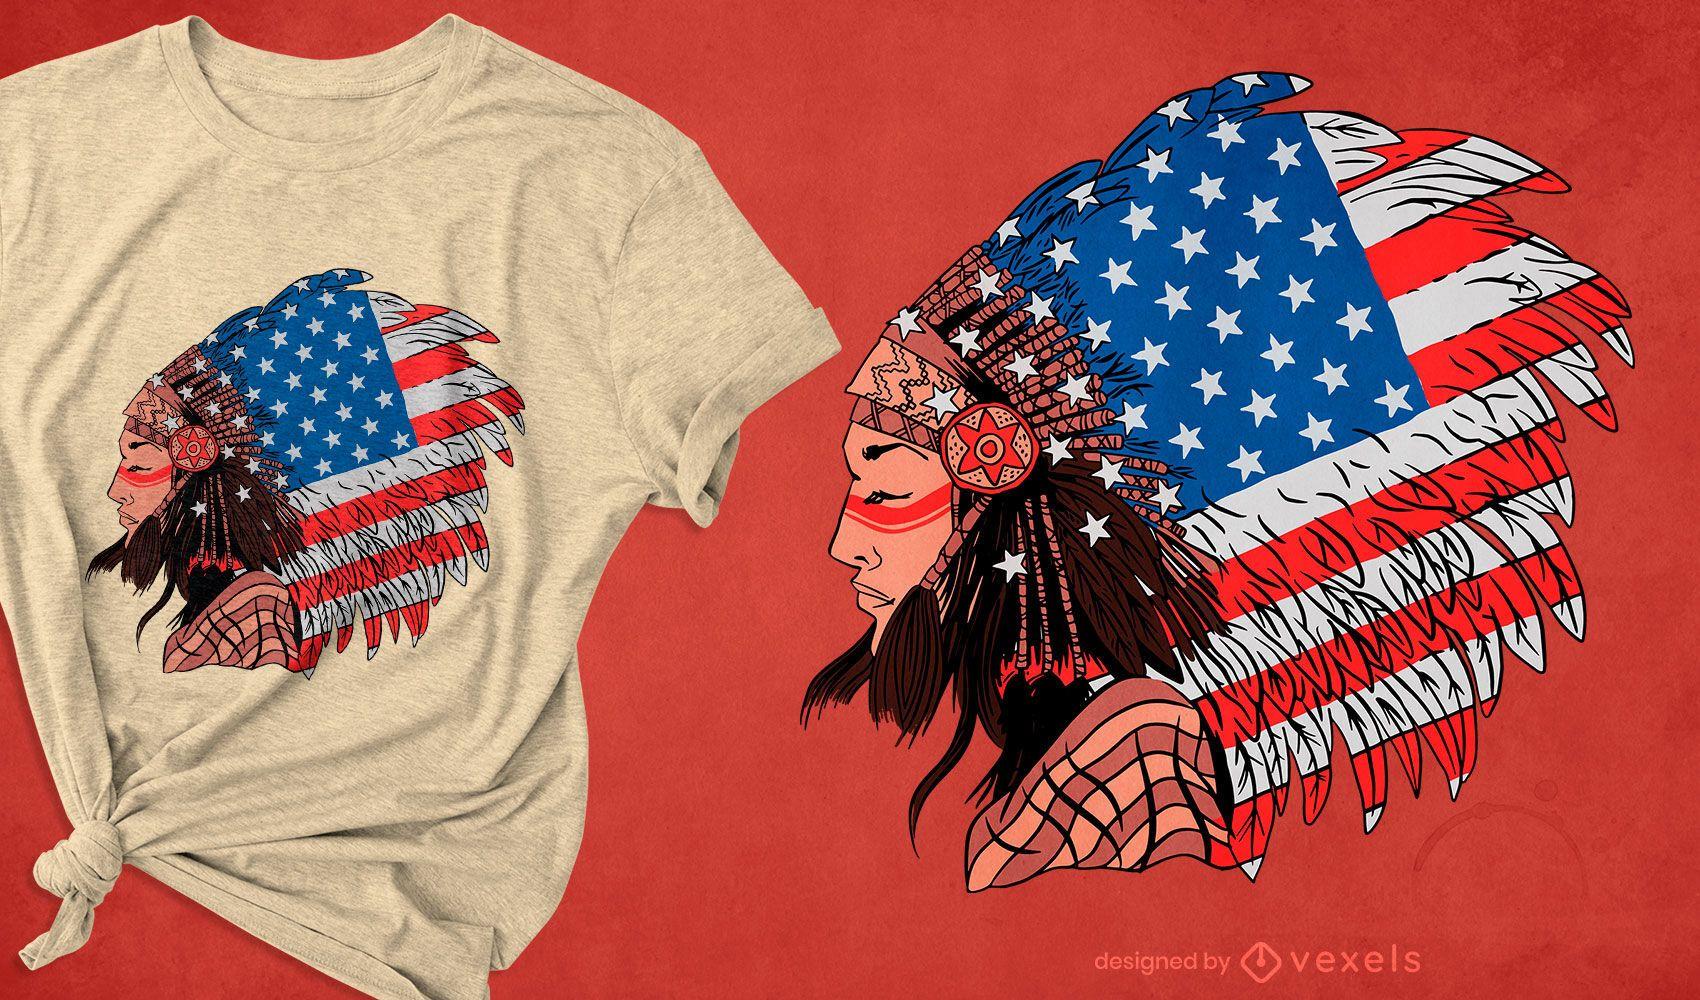 Native american woman t-shirt design